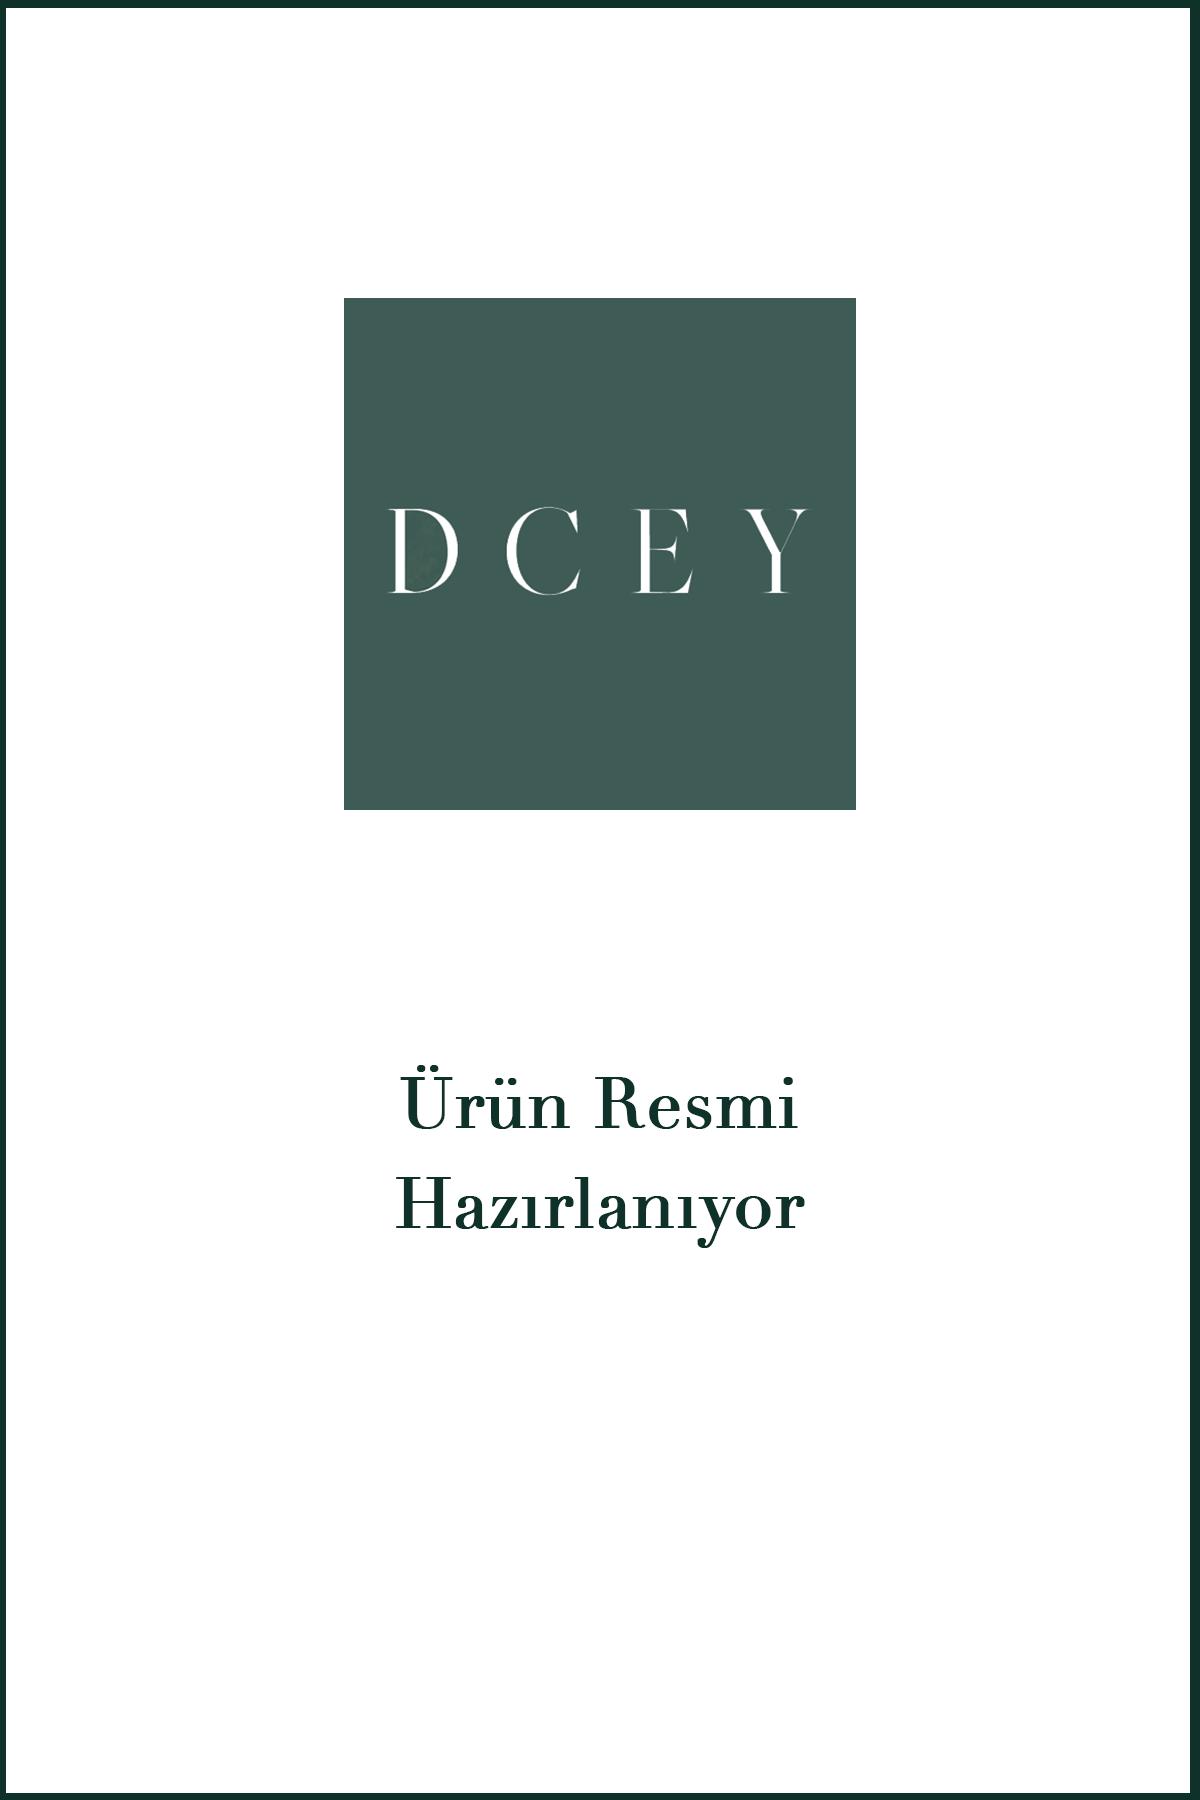 Frezya Elbise